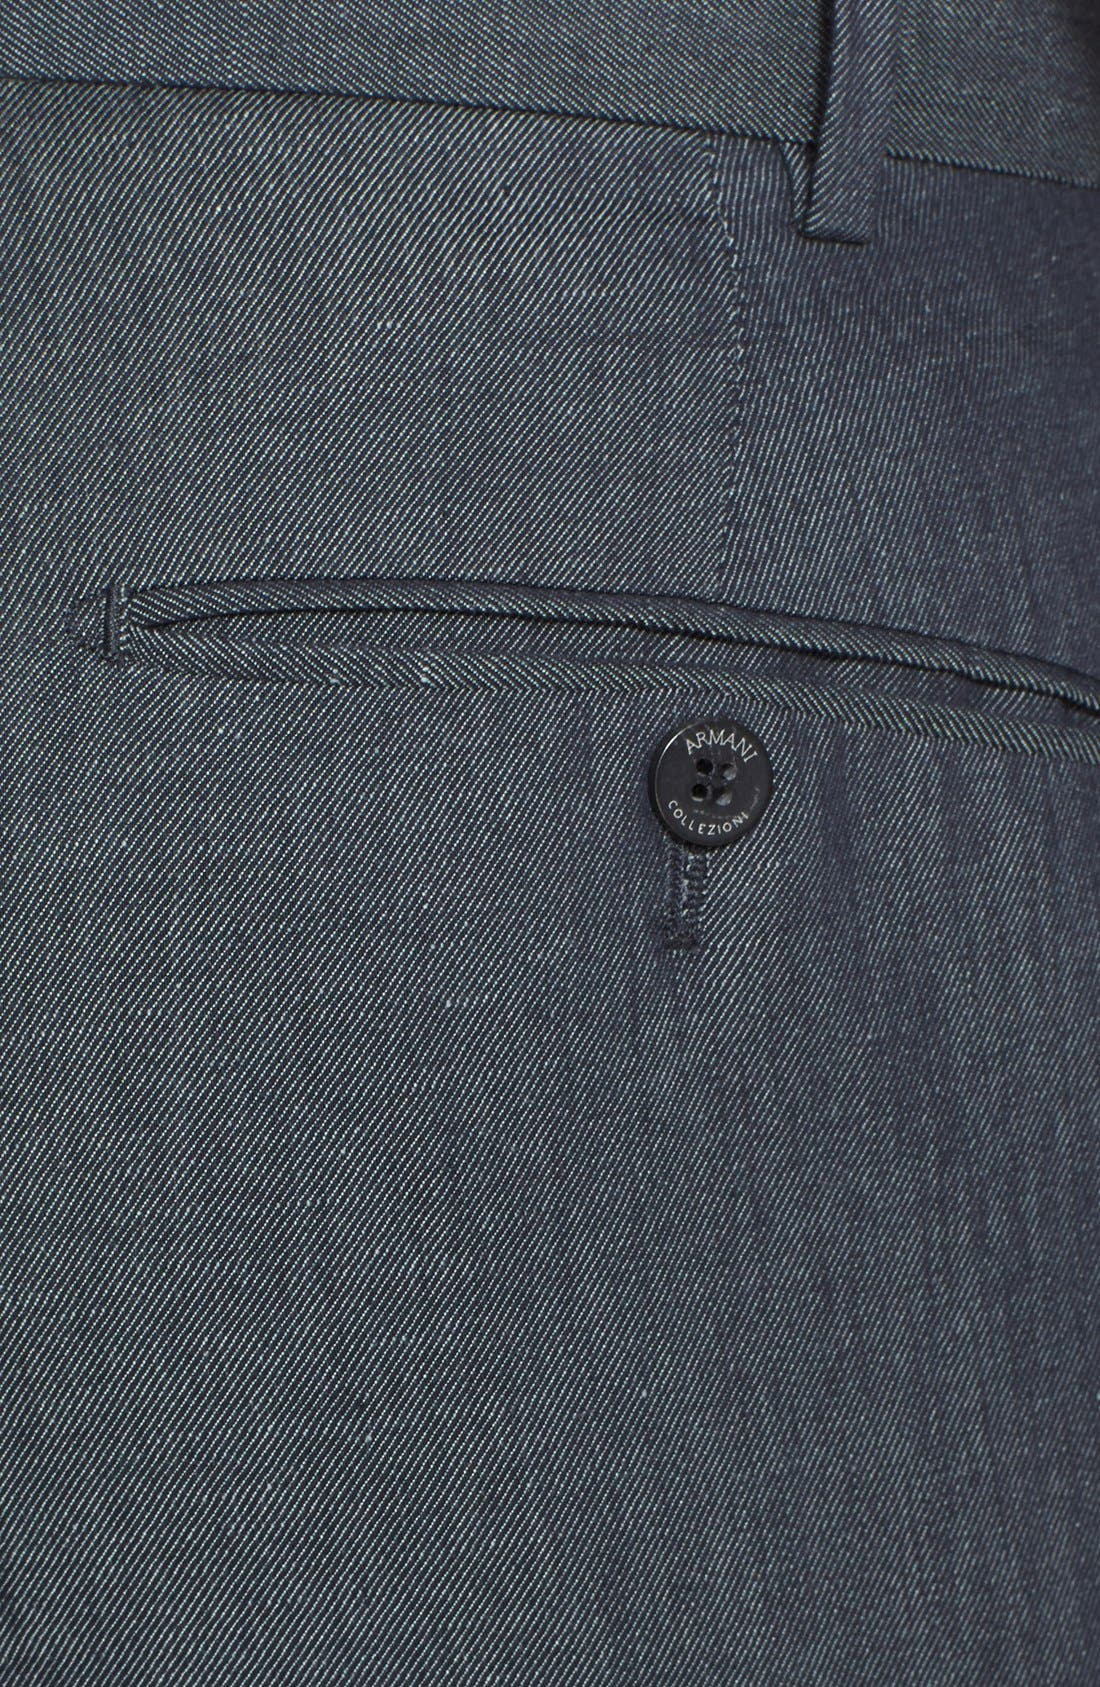 ,                             Armani Collezioni Flax & Cotton Flat Front Trousers,                             Alternate thumbnail 4, color,                             034